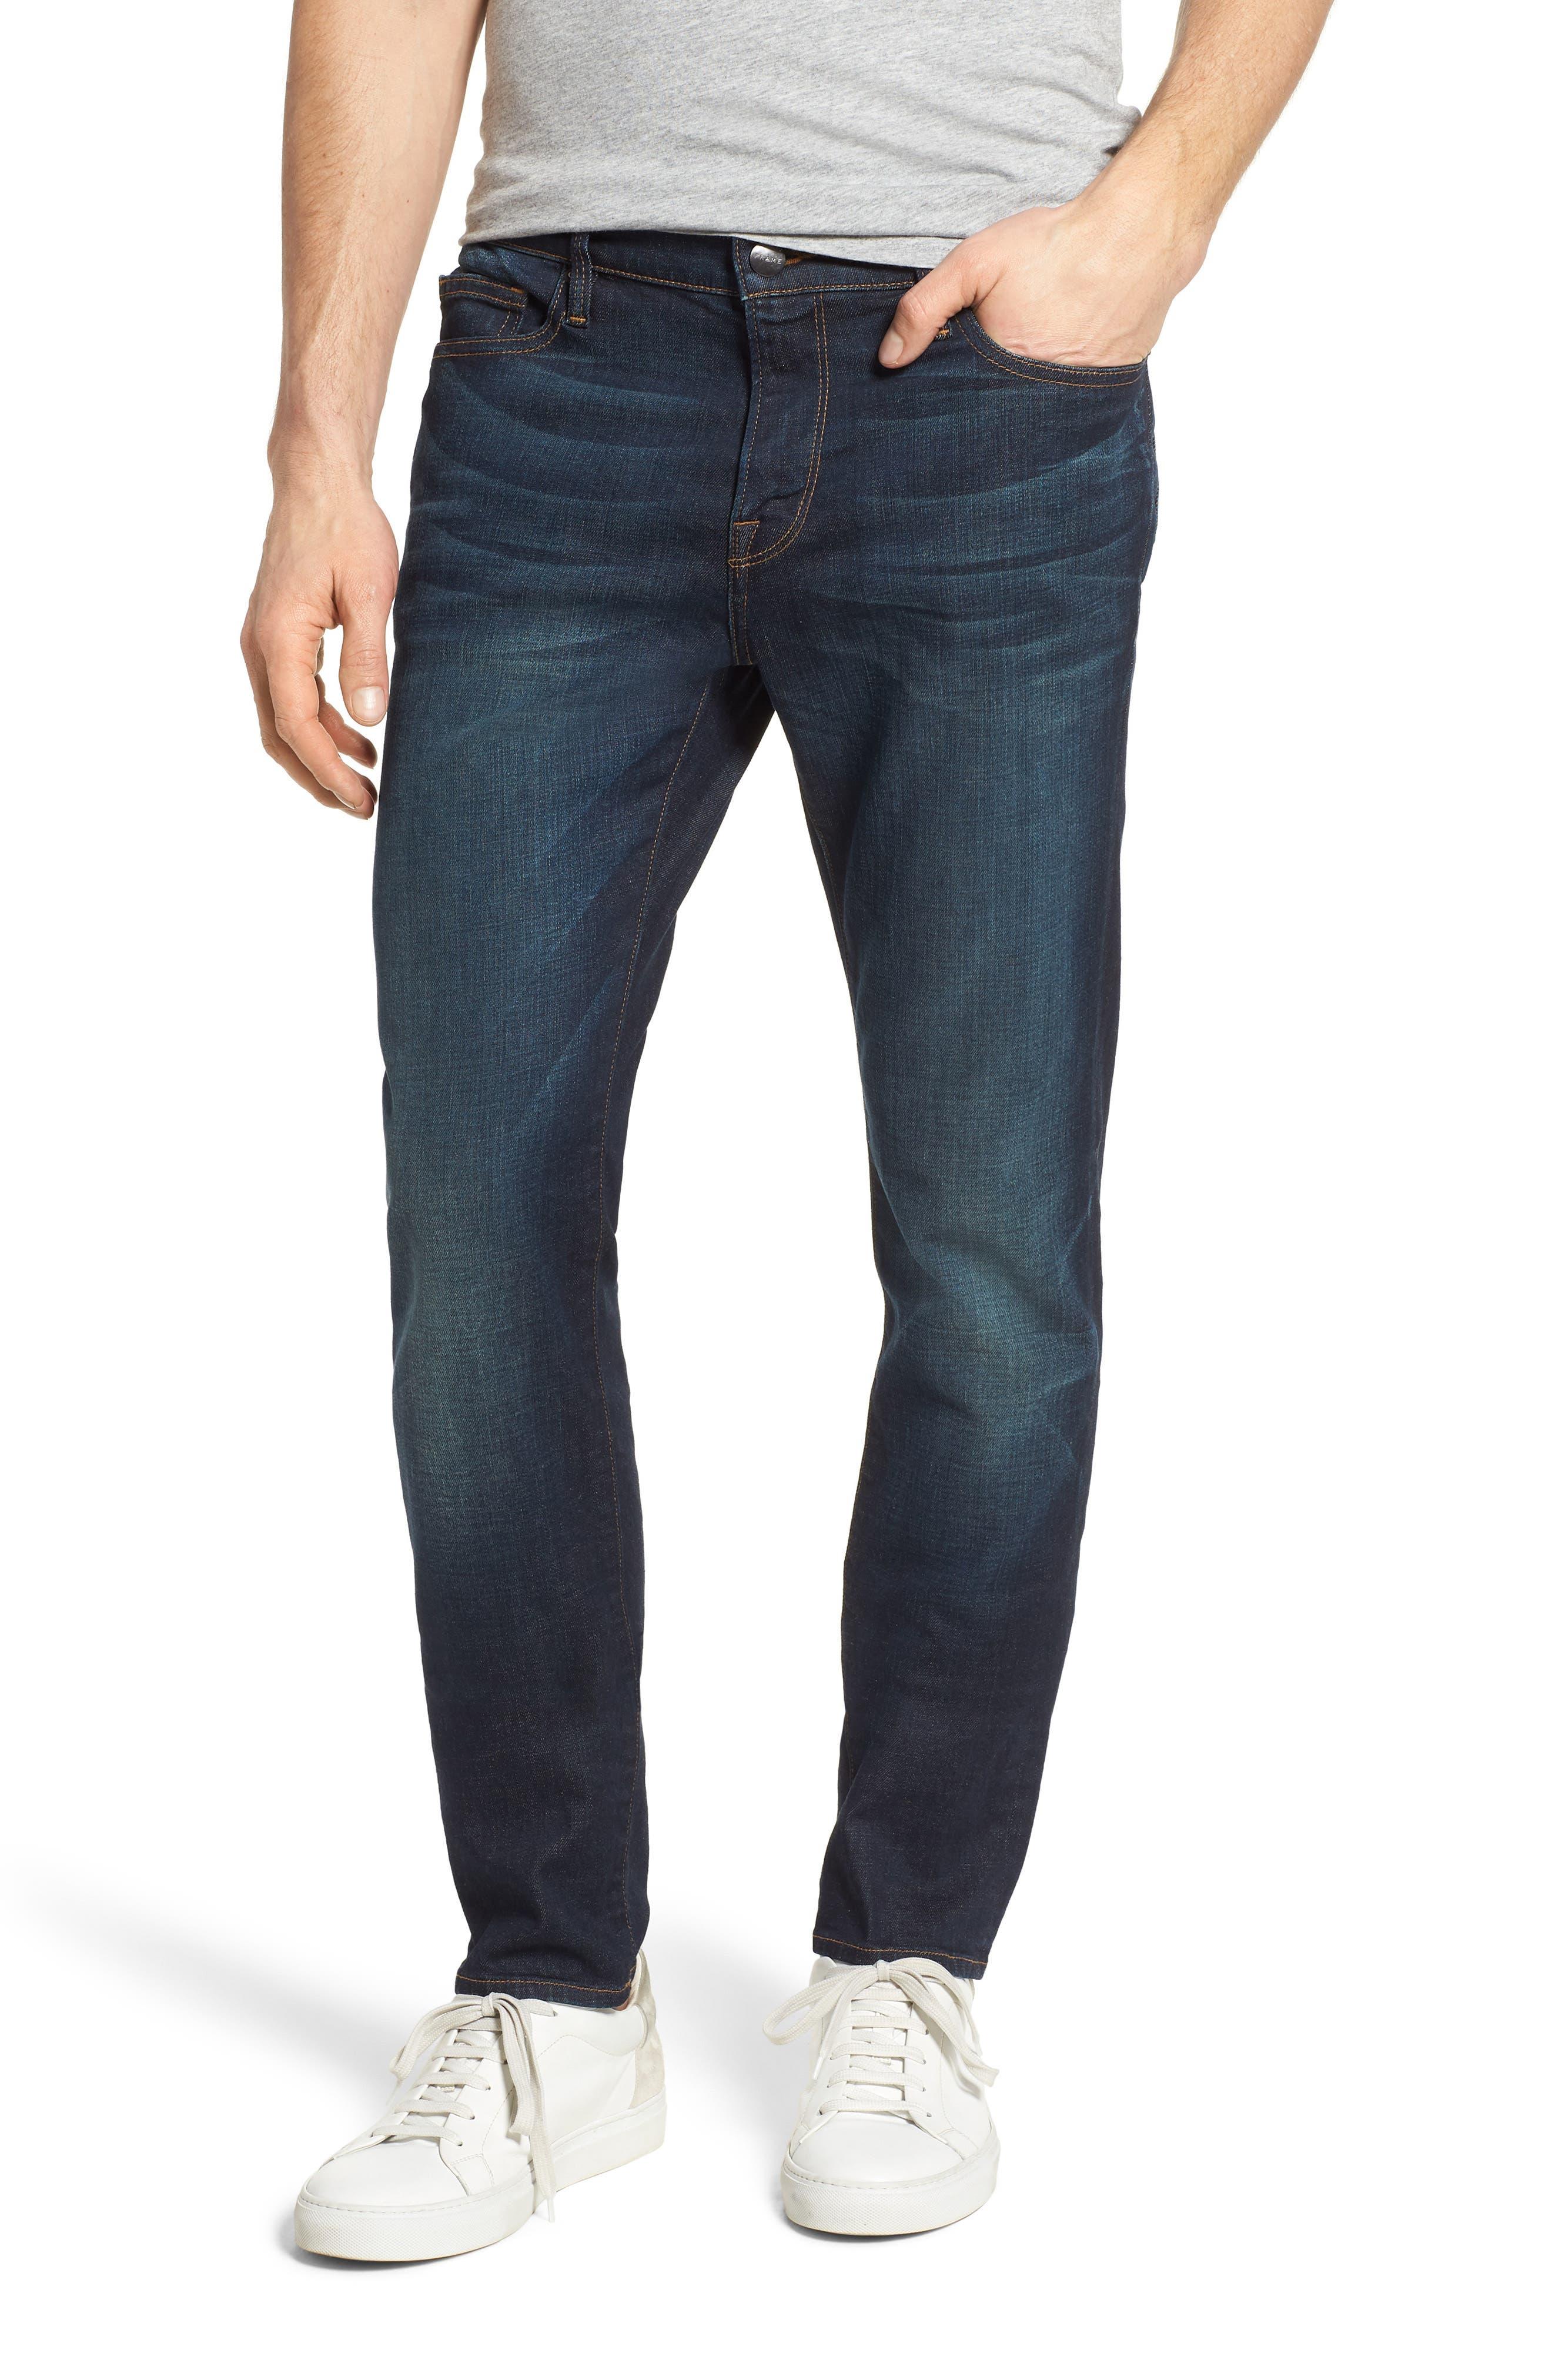 L'Homme Skinny Fit Jeans,                         Main,                         color, 404